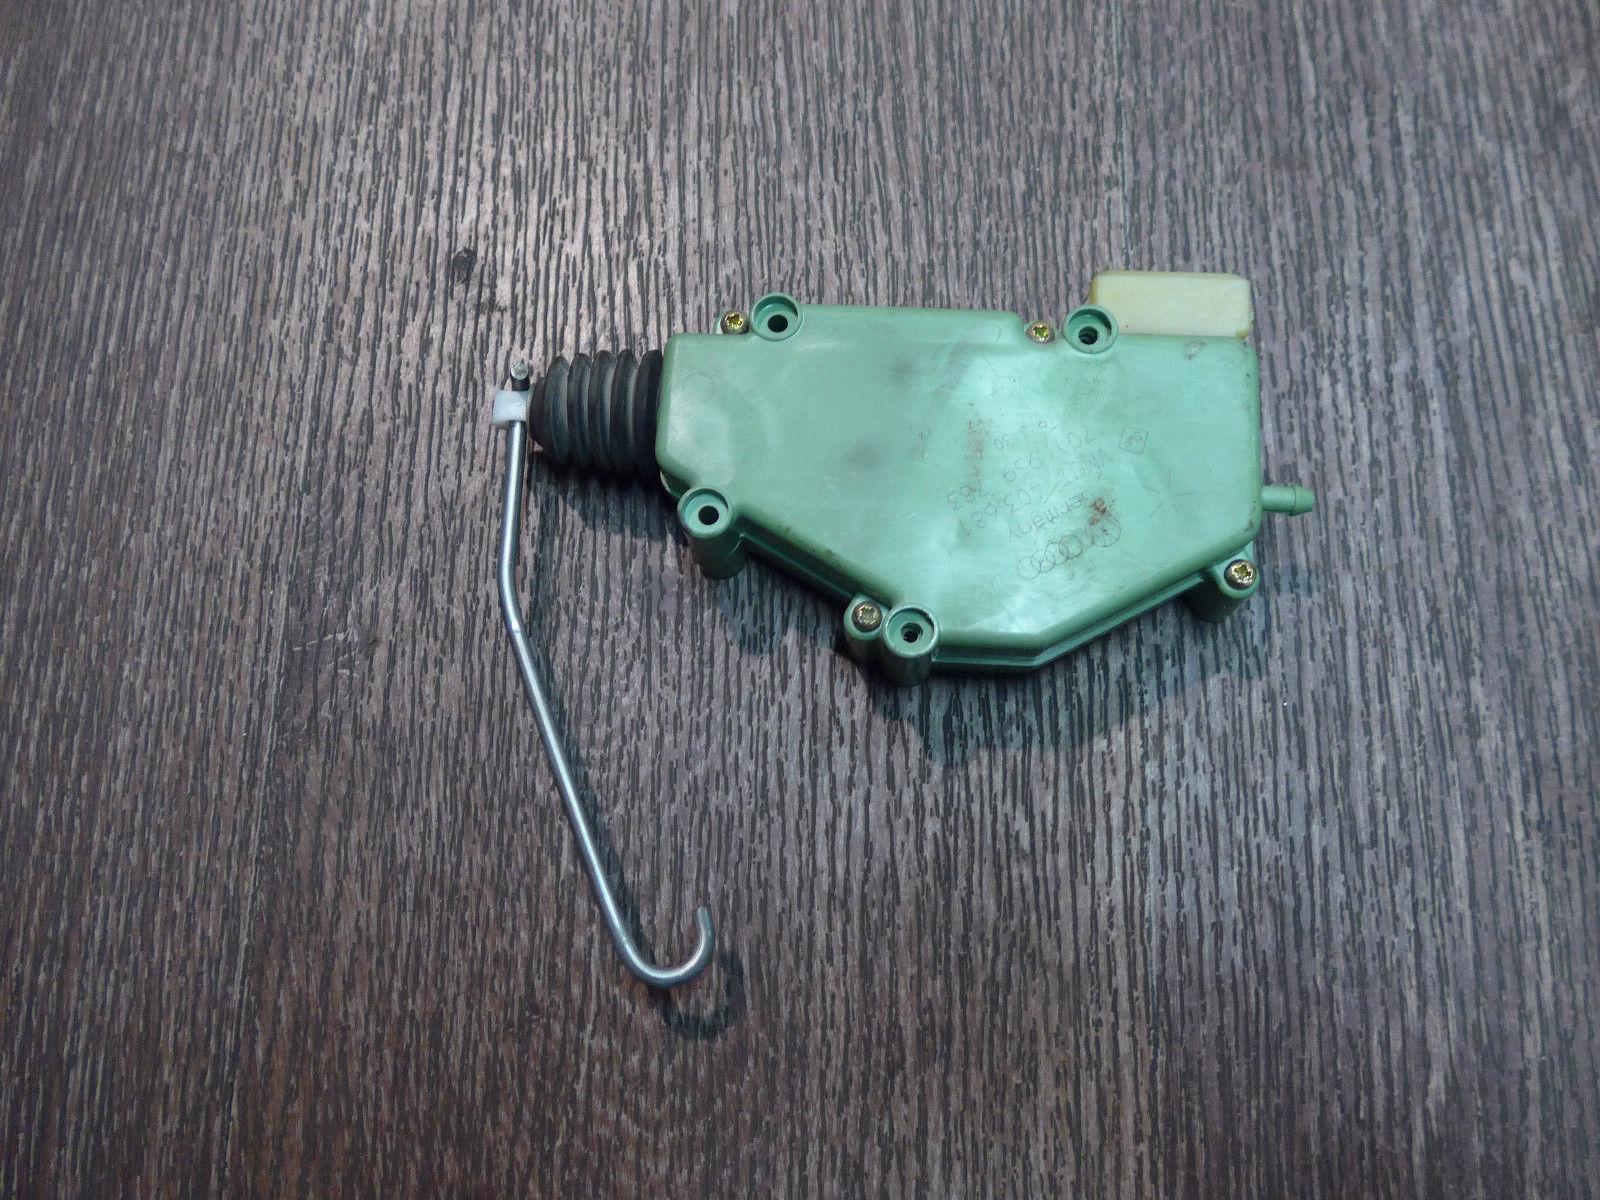 Stellmotor-ZV-Zentralverriegelung-Hinten-Heckklappe-701959783-VW-T4-_57.jpg